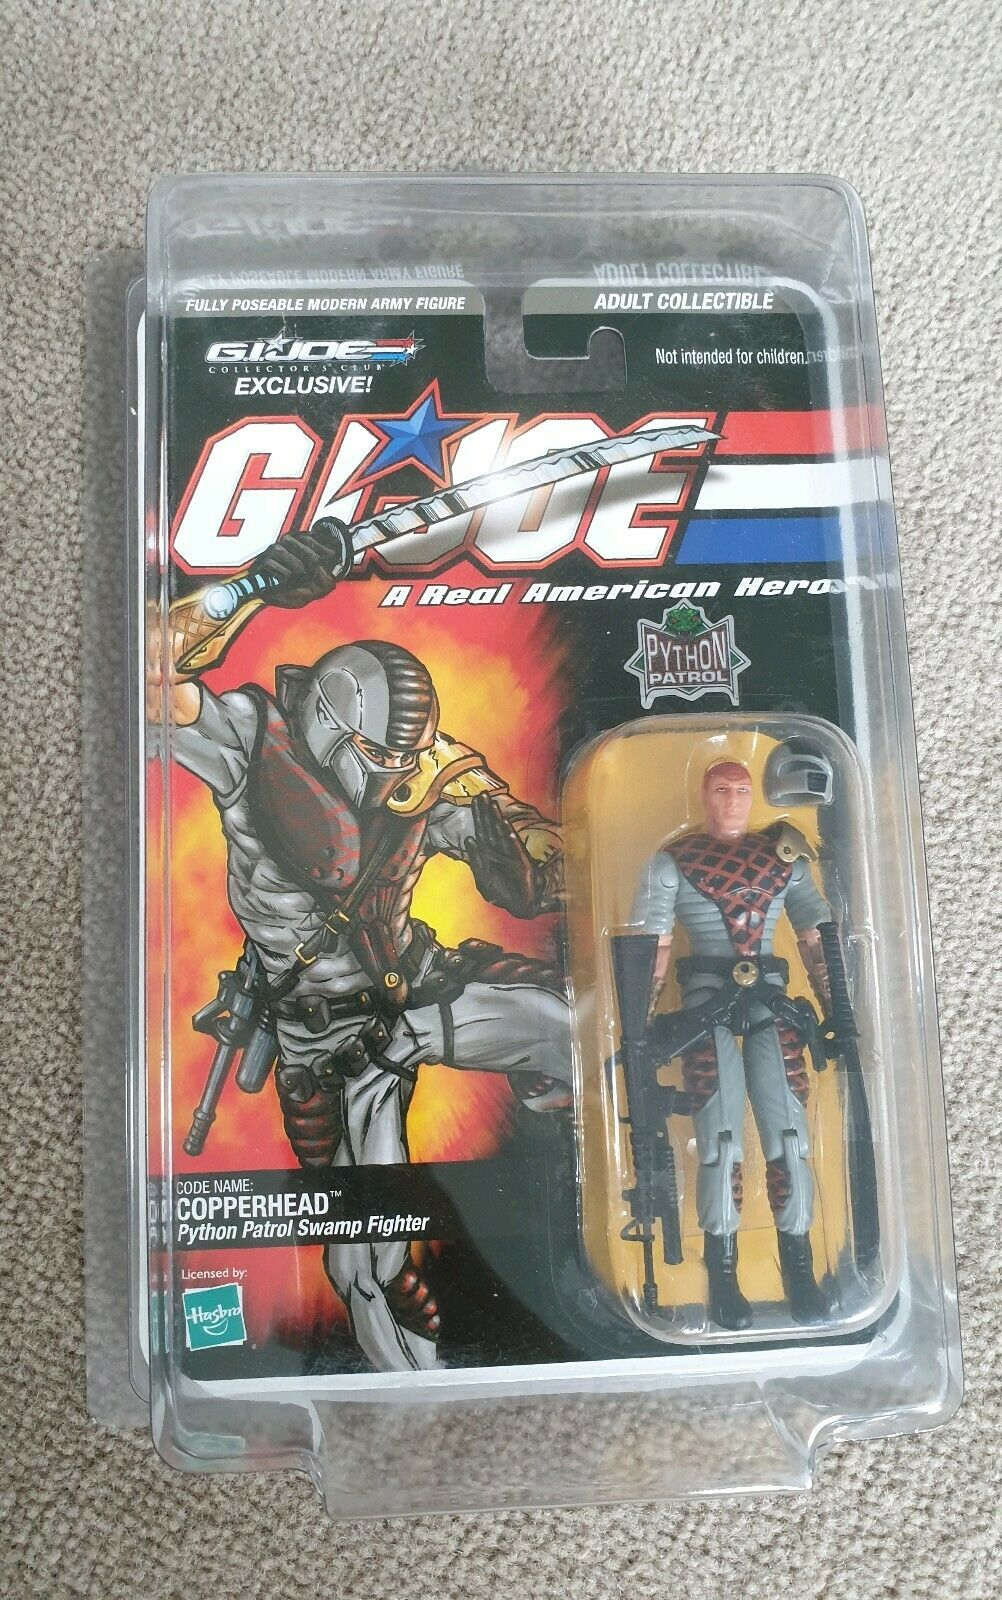 GI Joe collectors club copperhead python patrol swamp fighter